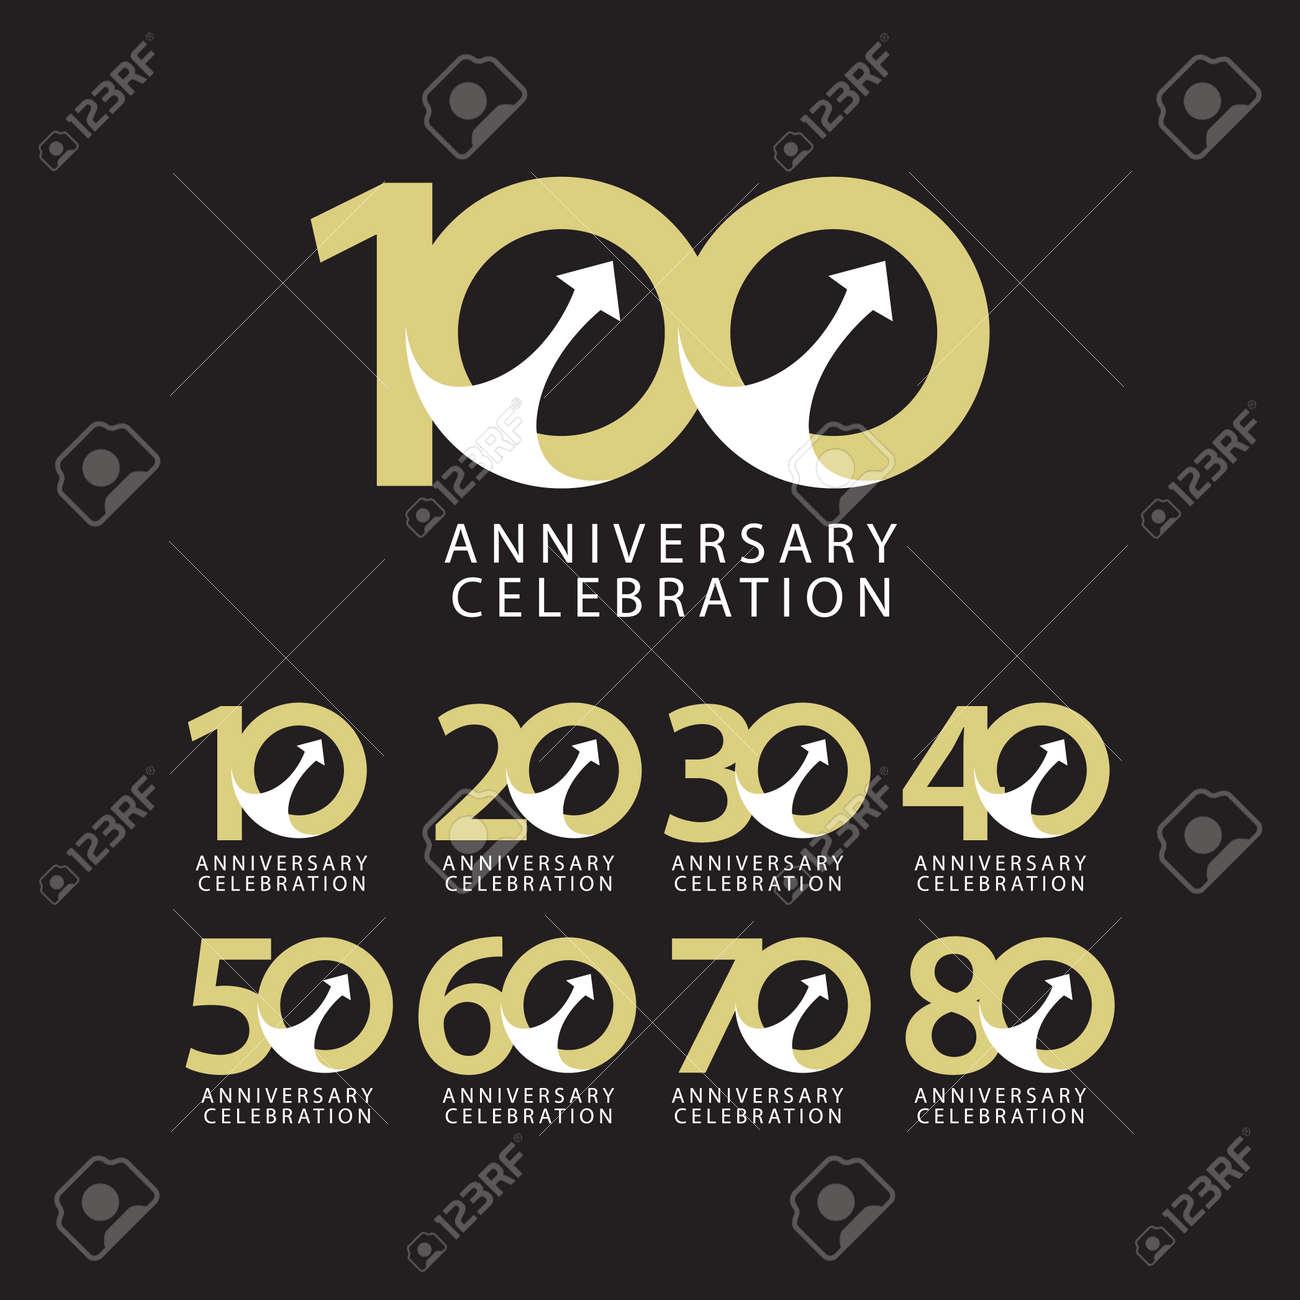 100 Years Anniversary Celebration Vector Template Design Illustration - 163698044